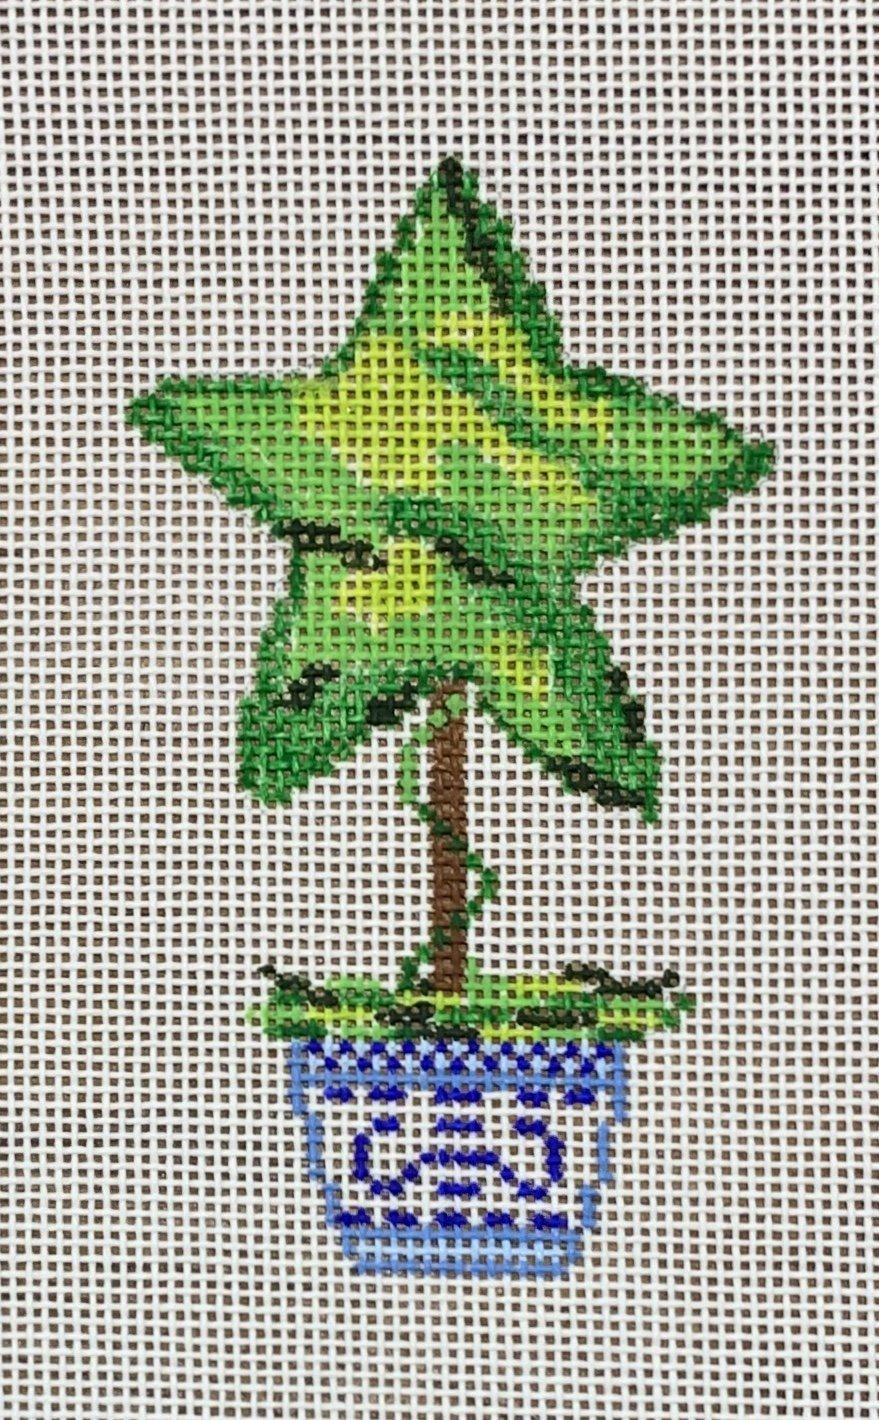 Topiary - Star